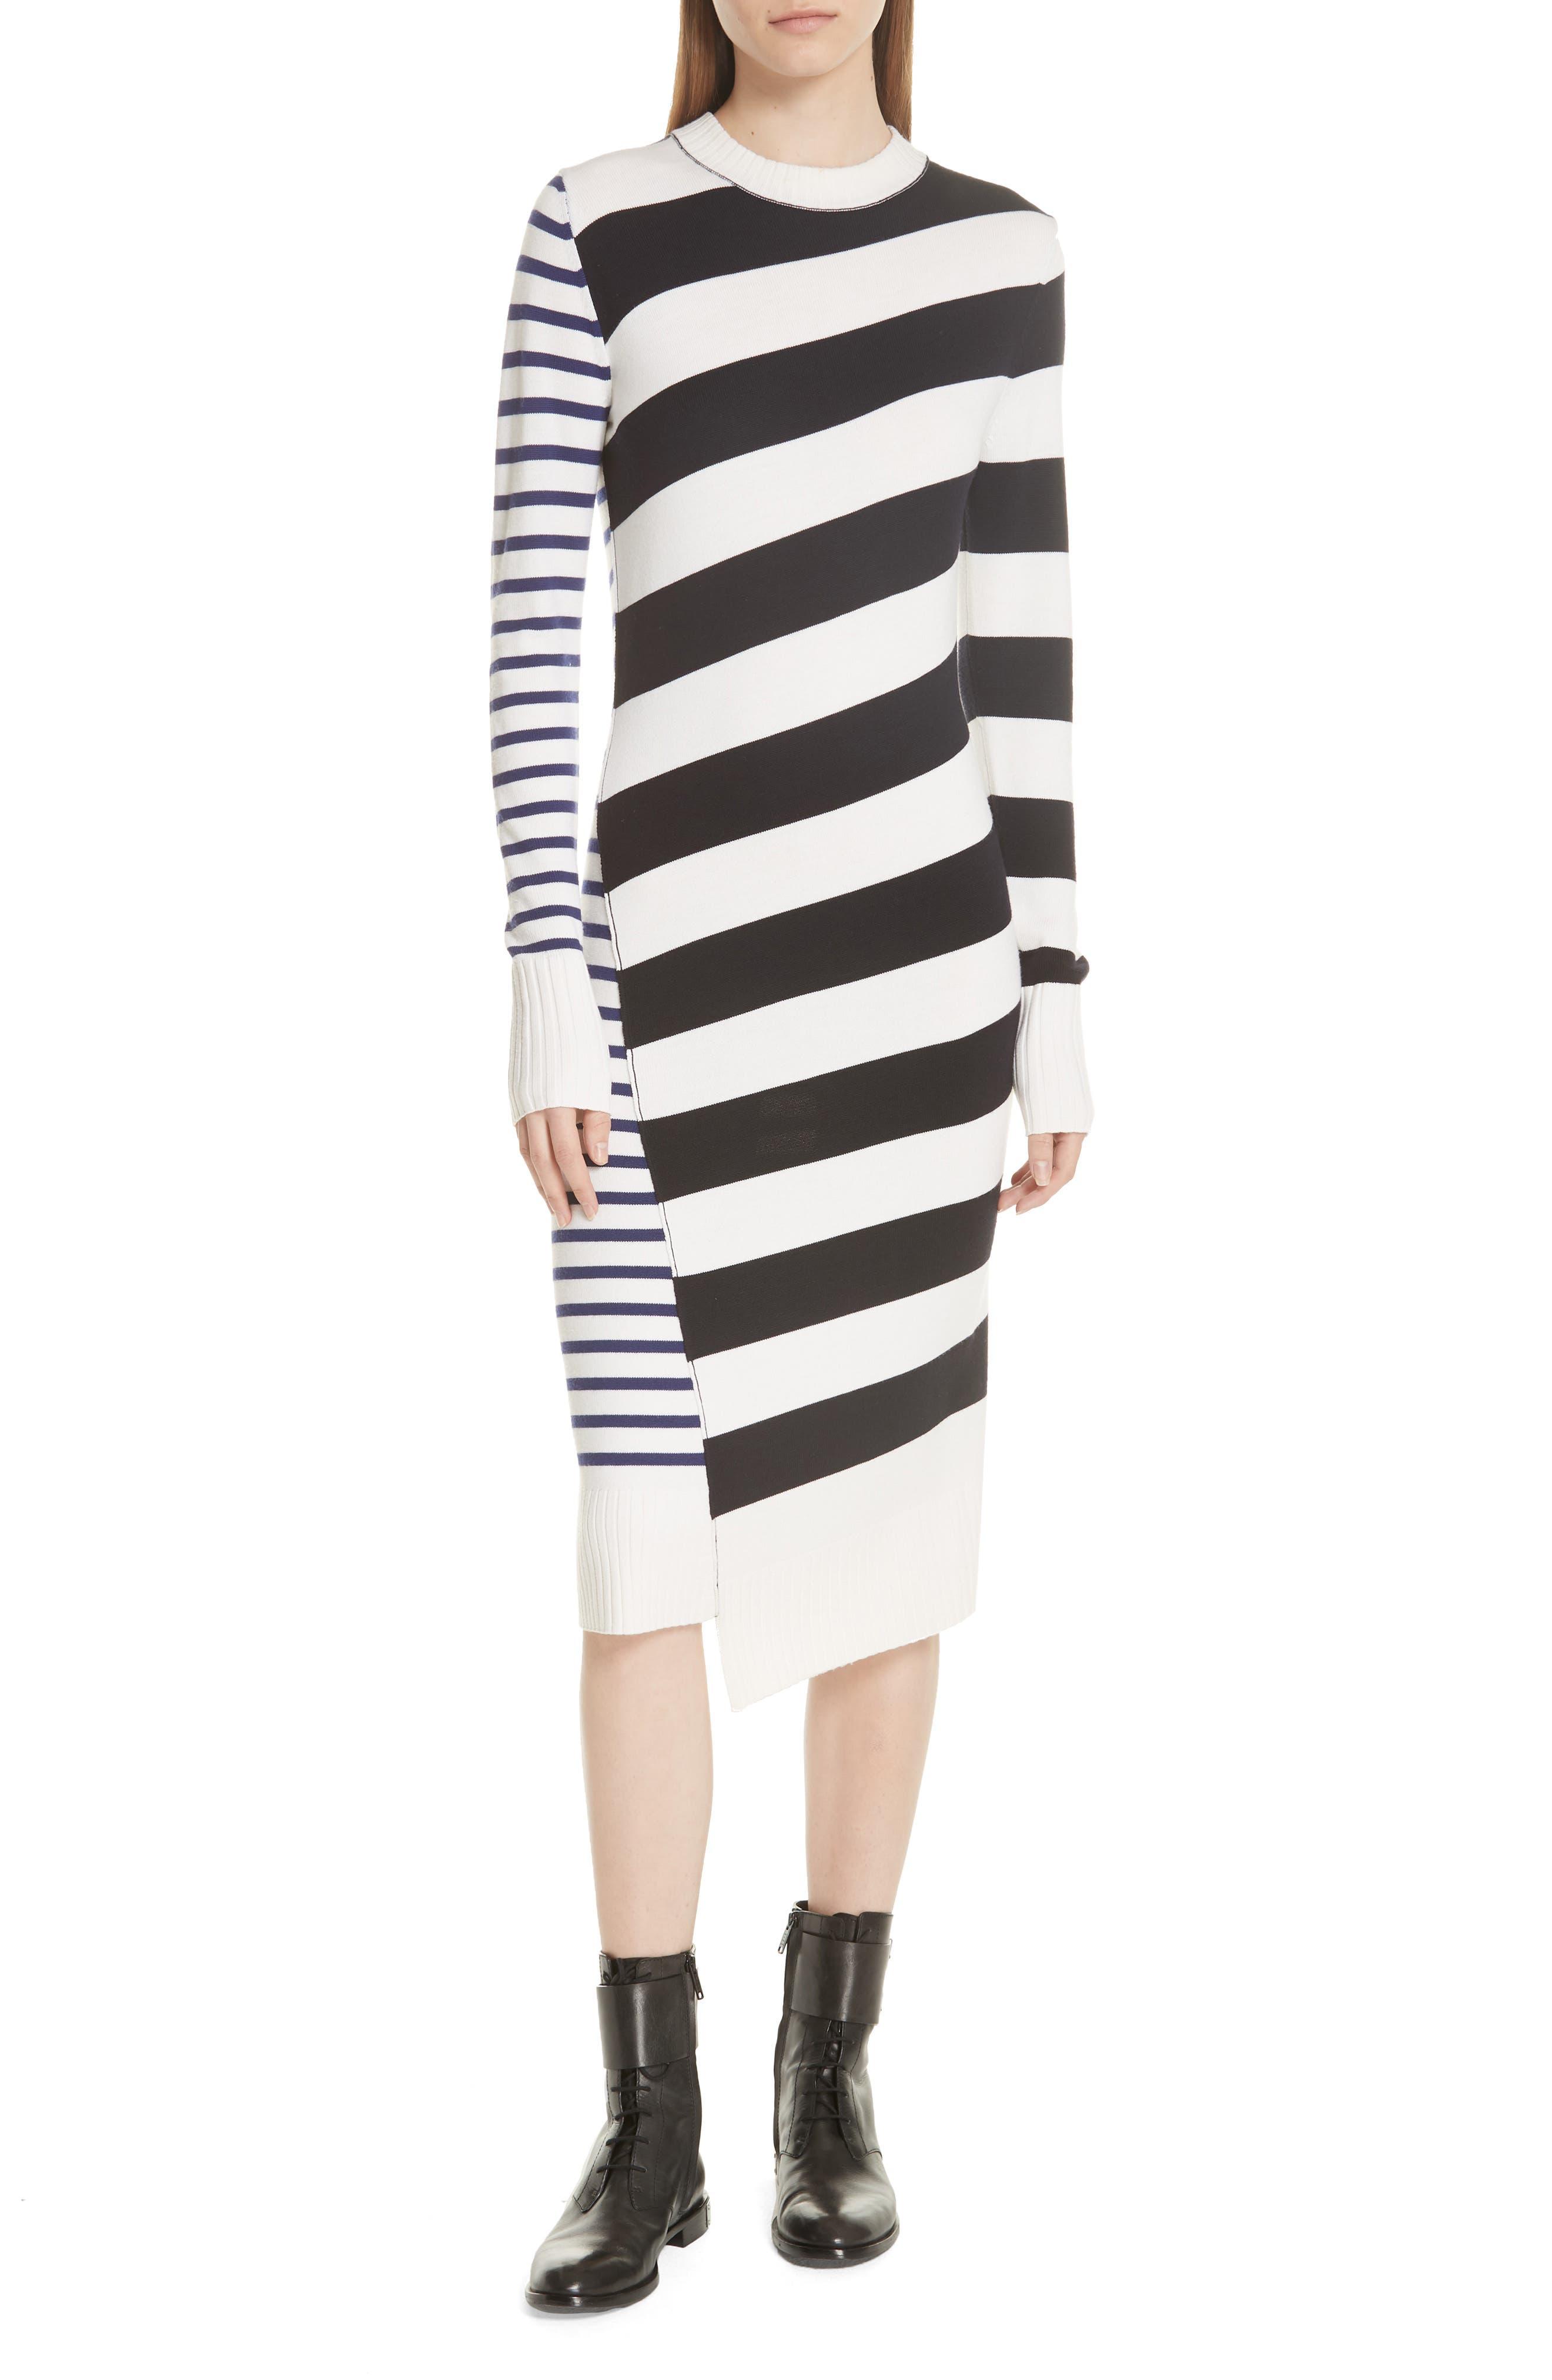 GREY JASON WU Mixed Stripe Merino Wool Sweater Dress in Star White/Midnight